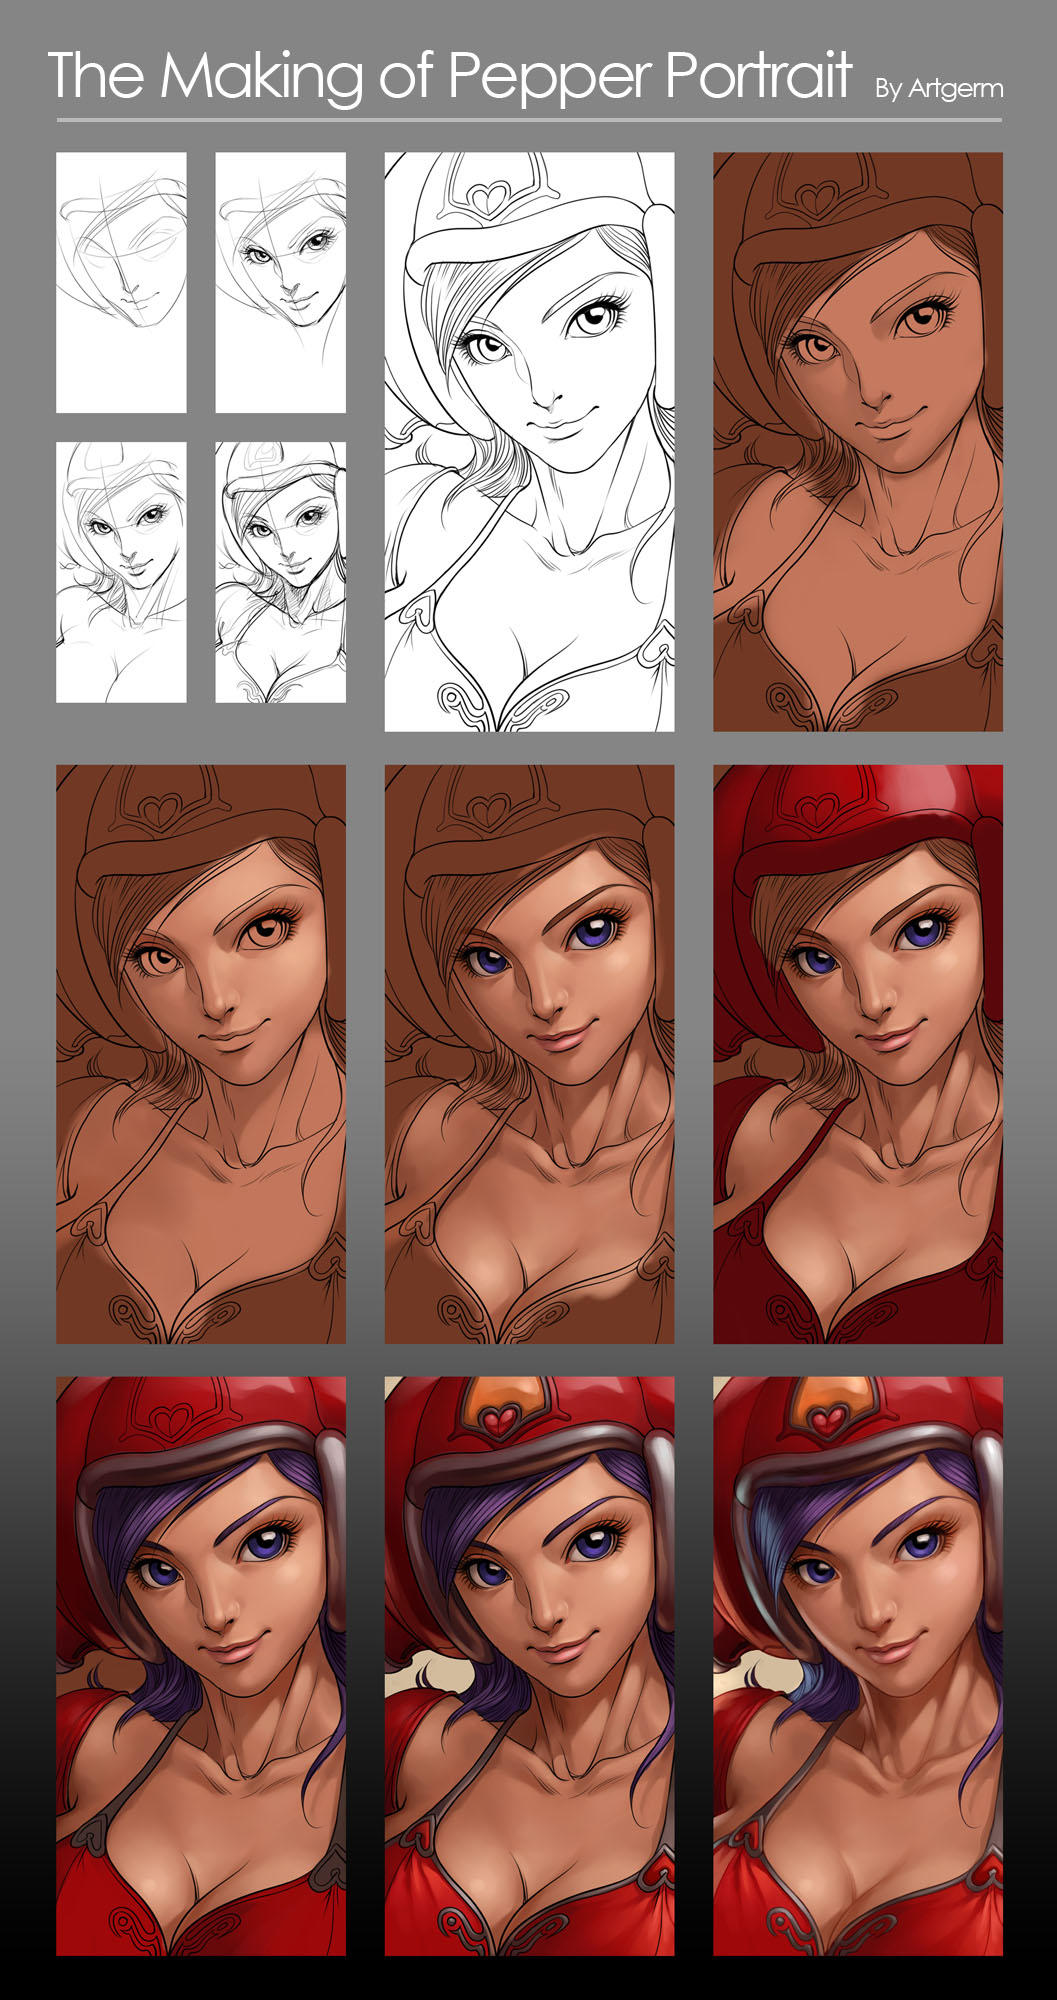 Pepper Portrait - Process by Artgerm